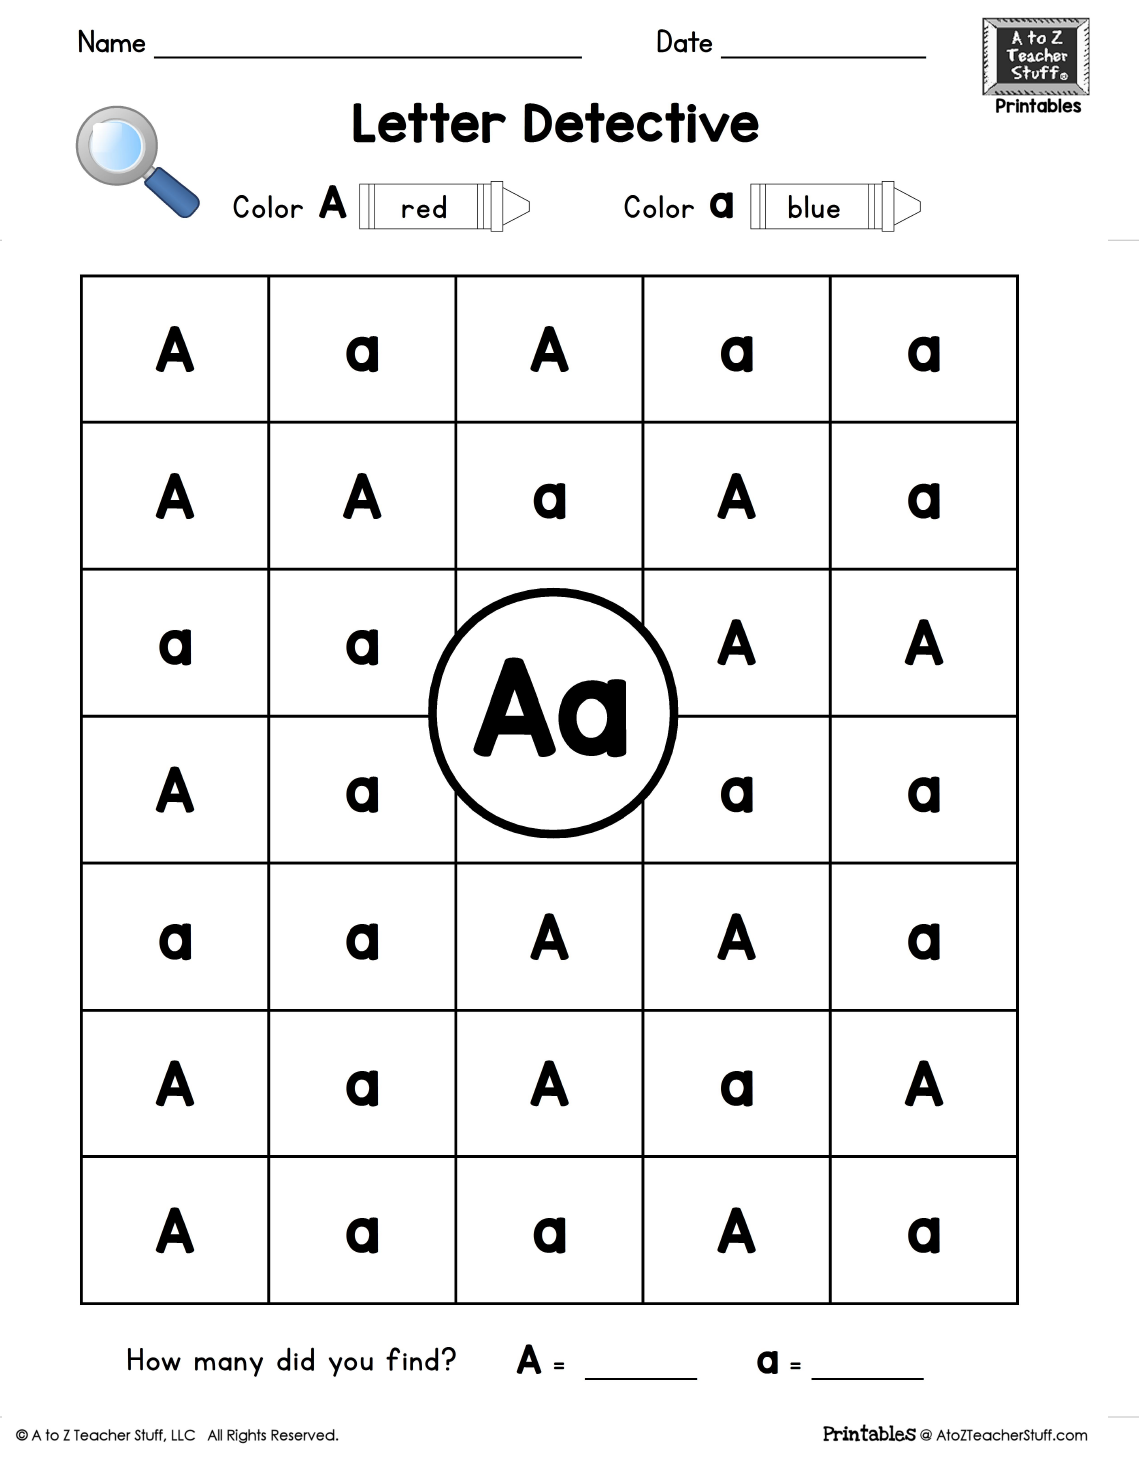 49 Marvelous Letter Recognition Activities Printables inside Alphabet Recognition Worksheets Free